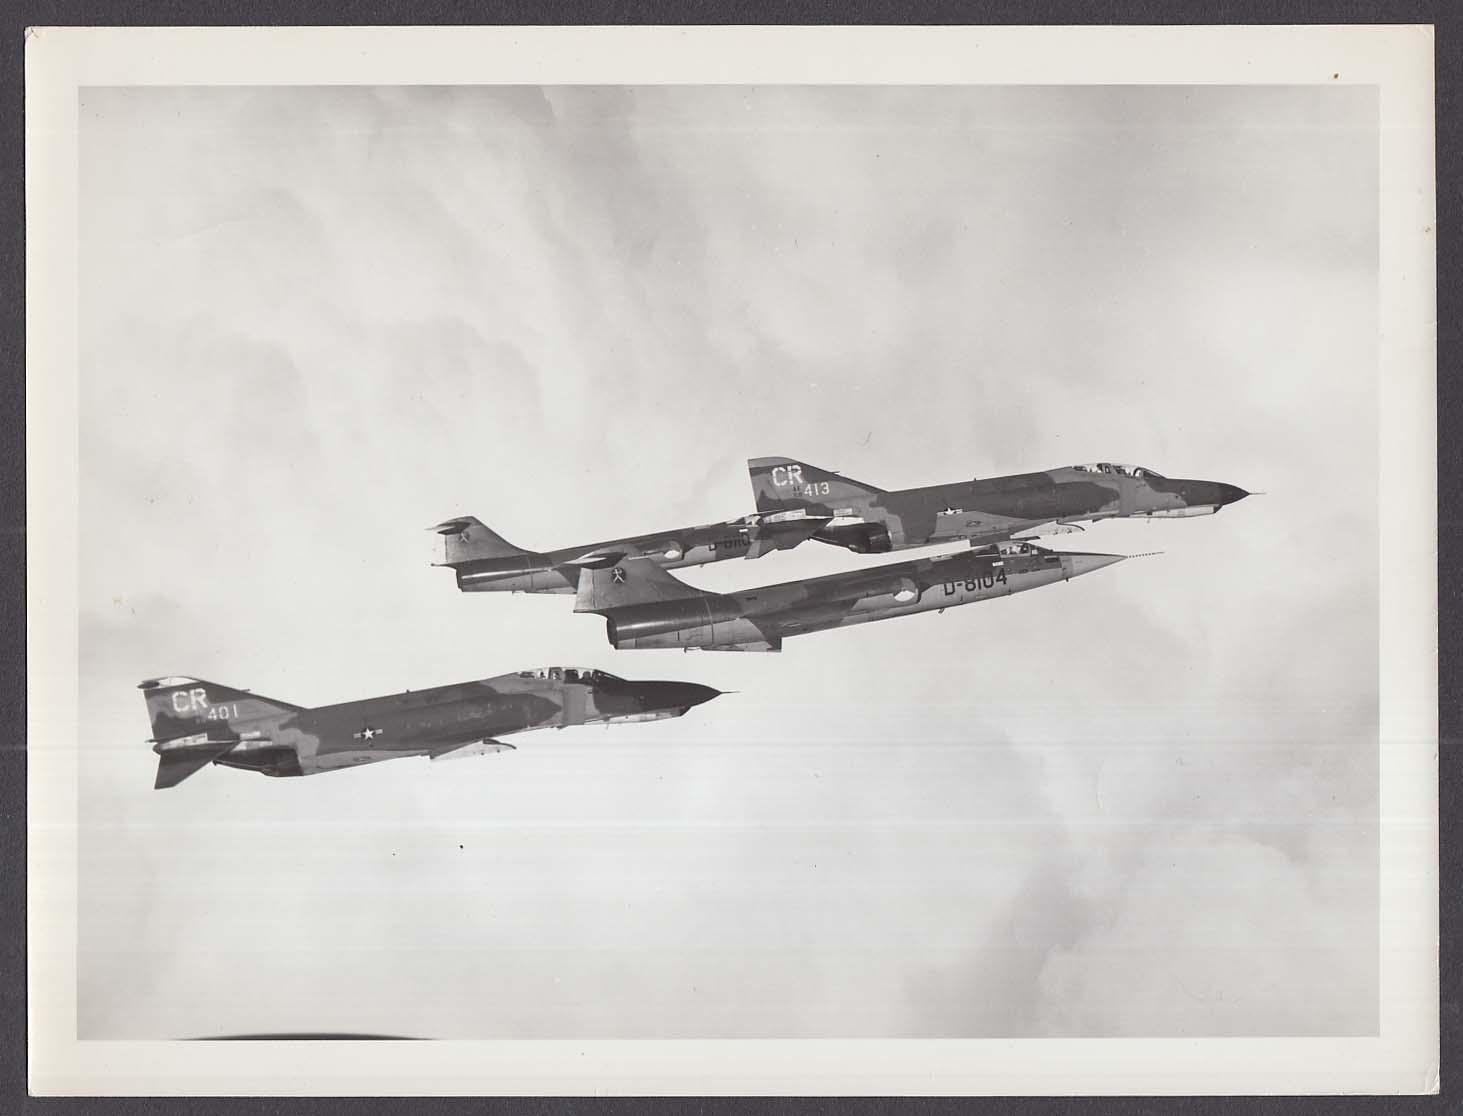 Royal Netherlands F-104 Starfighter formation with USAF F-4E Phantom 8x10 photo